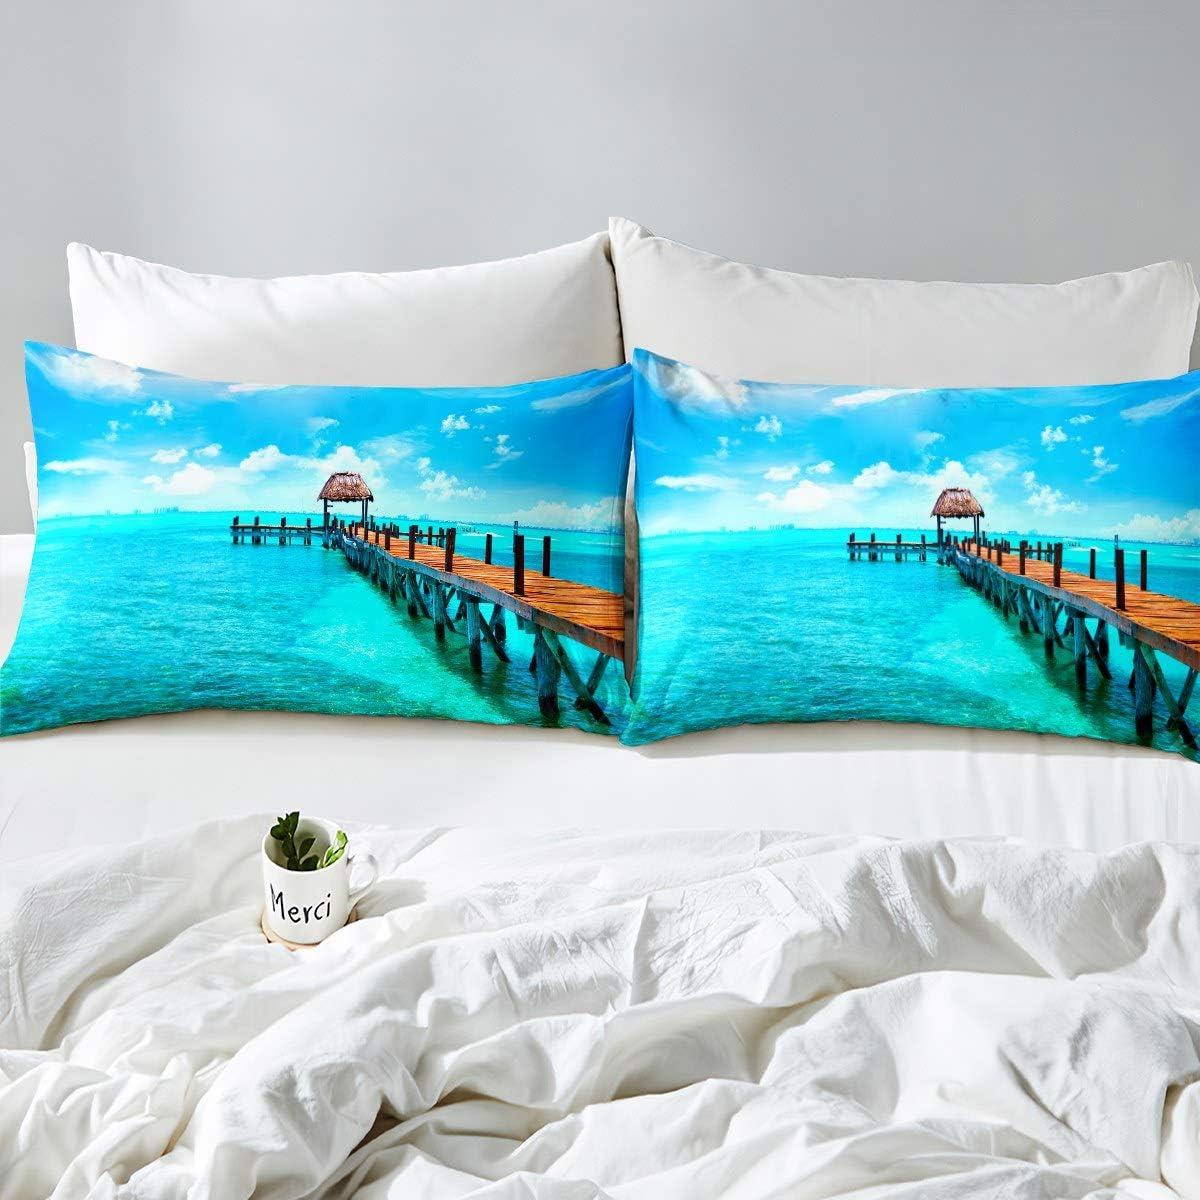 Kids Sea Turtle Bed Sheet Set for Little Boys Girls Child Bedroom Nursery Ocean Theme Animals Bedding Set 3D Reptile Marine Sea Underwater World Fitted Sheet Decor 3 Pcs Full Size